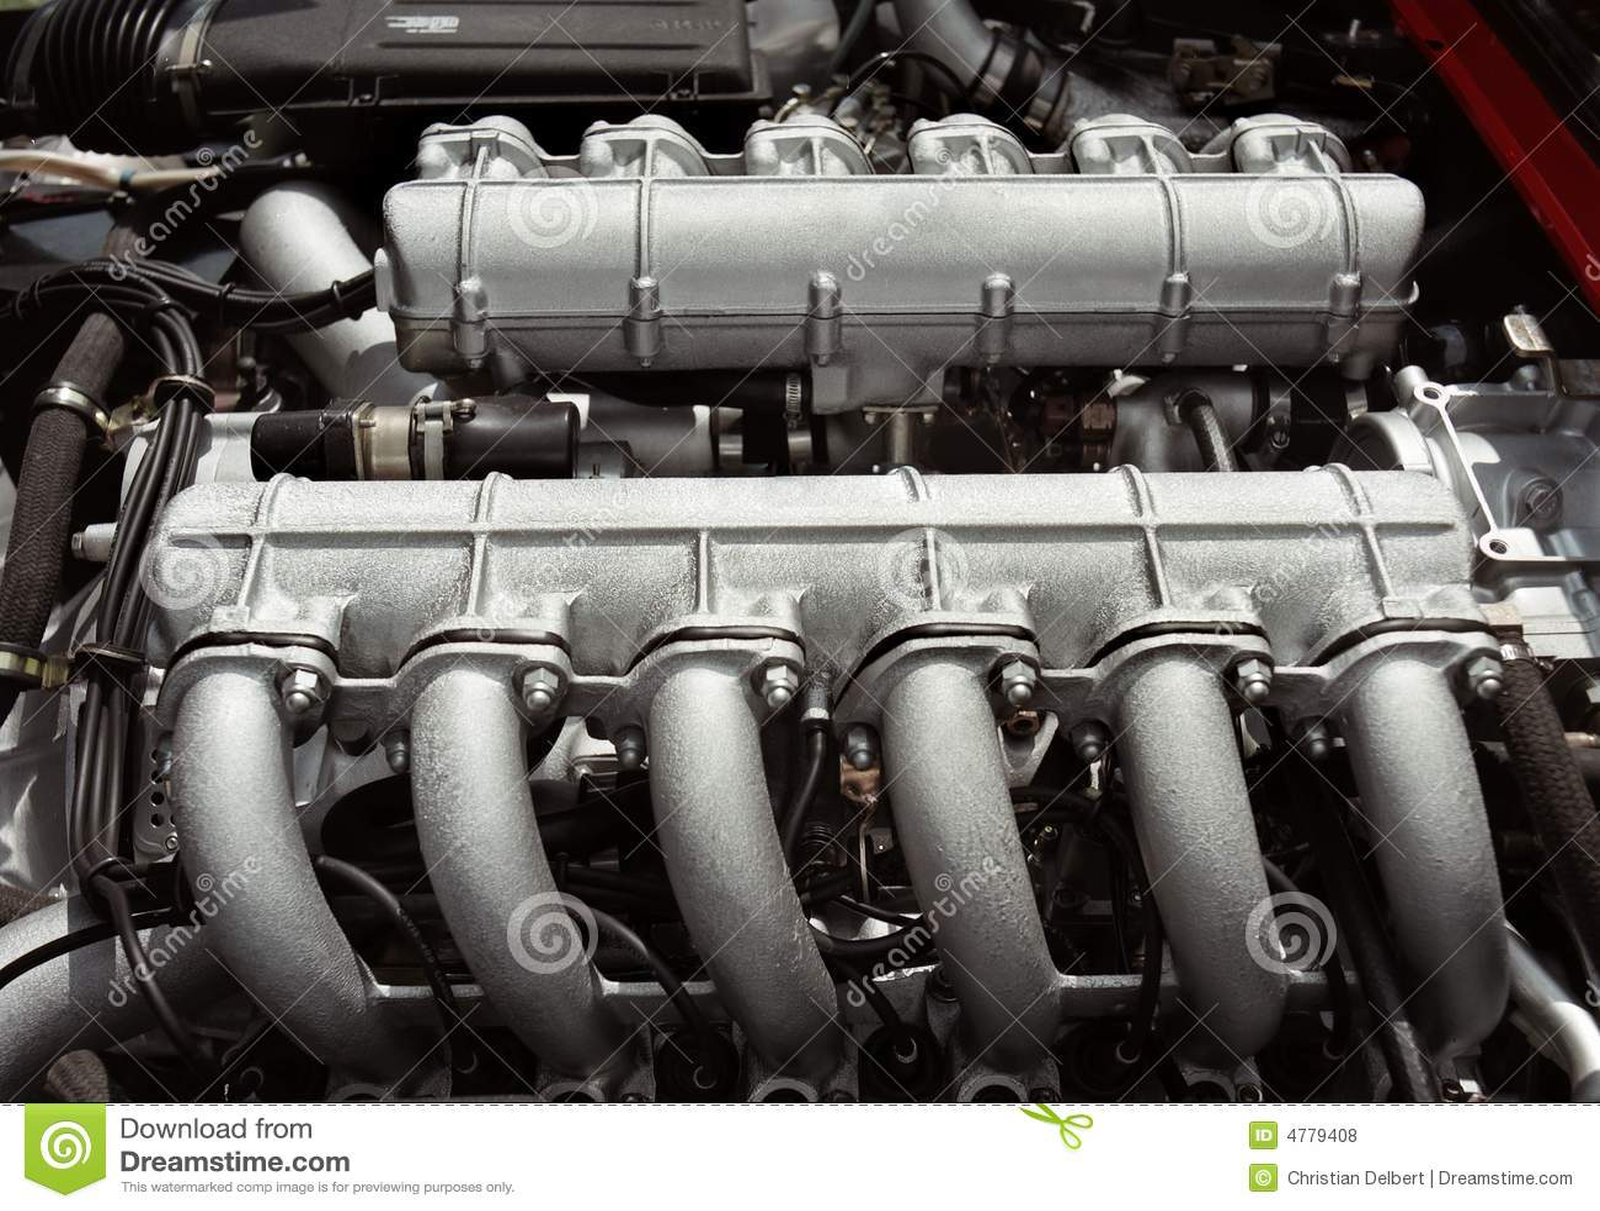 12 Cylinder Race Car Engine Royalty Free Stock Photos